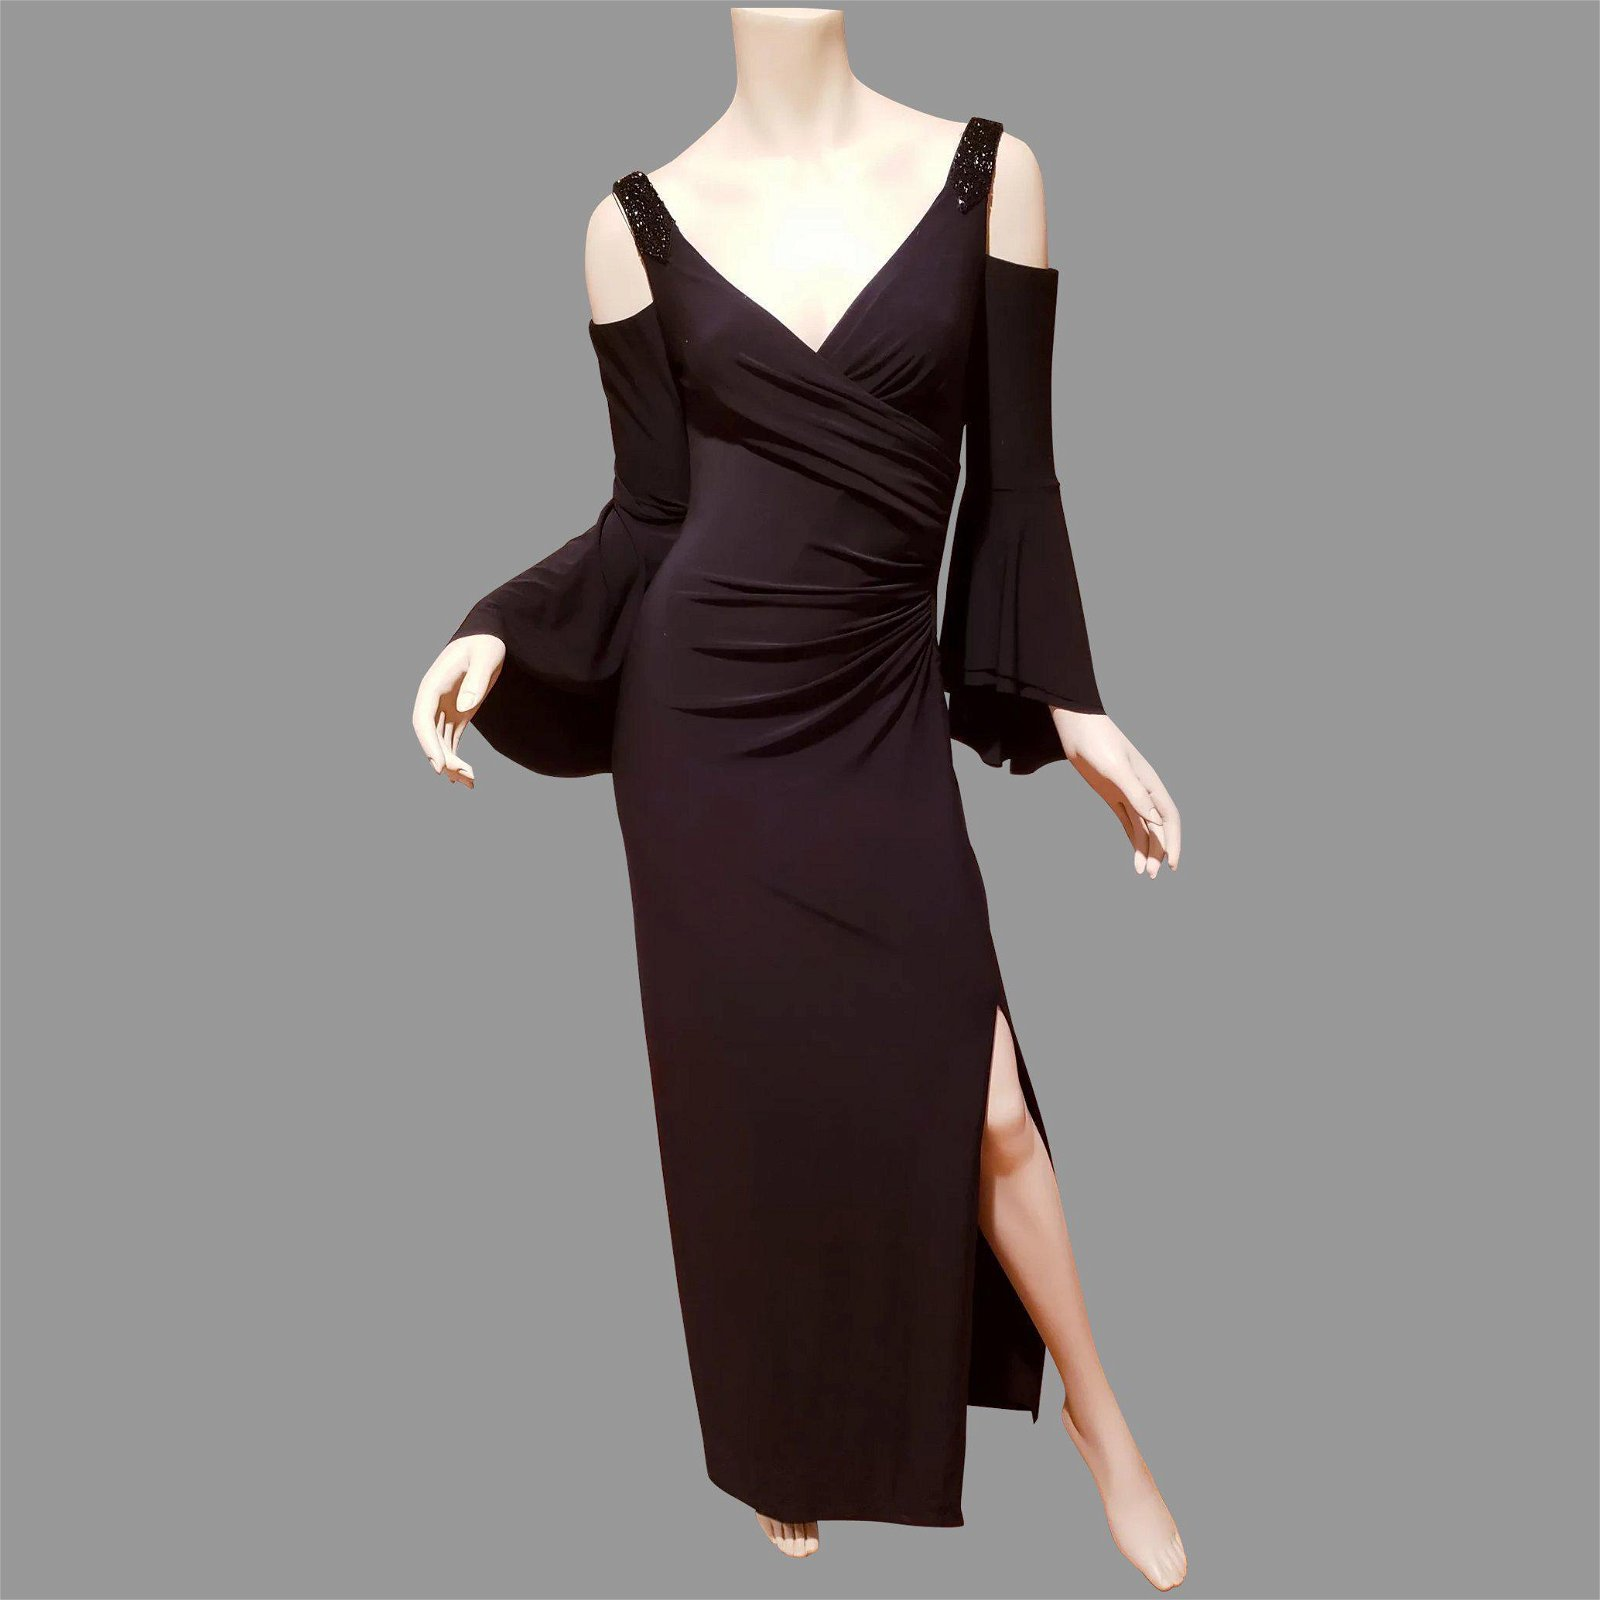 Ralph Lauren 90's cold shoulder high slit maxi gown